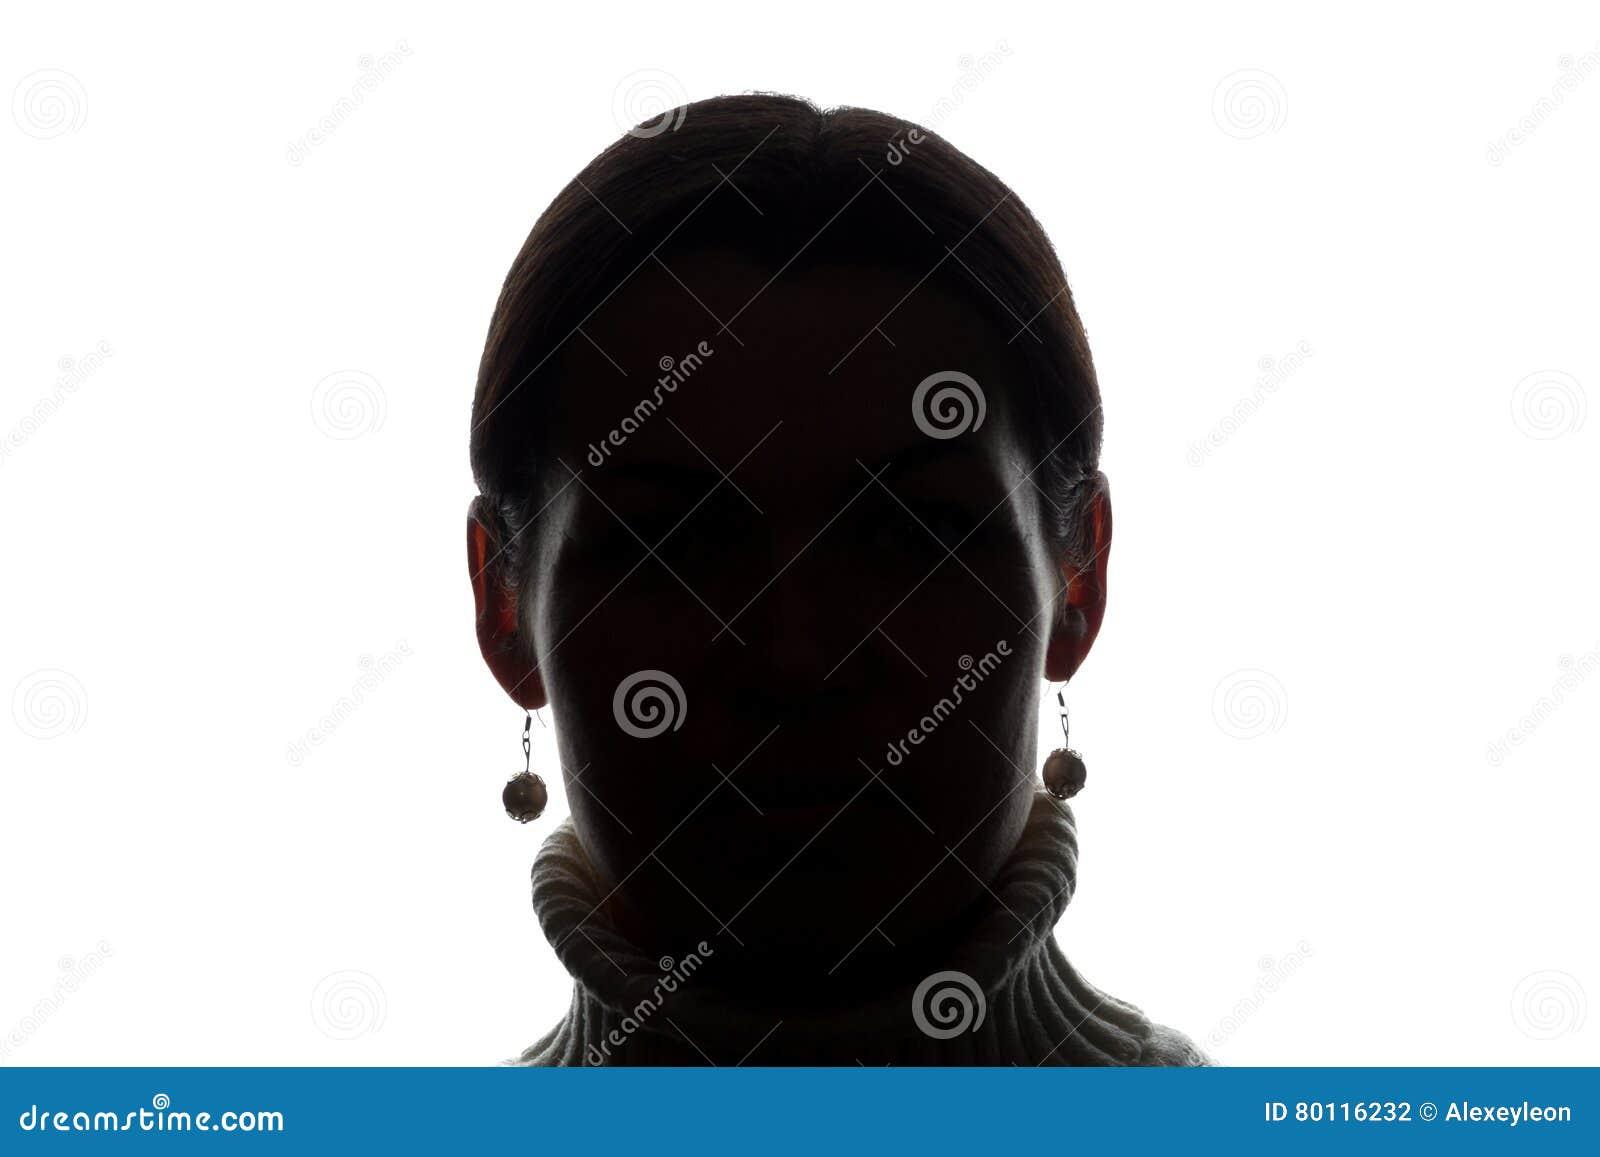 Look ahead de la mujer joven - silueta horizontal